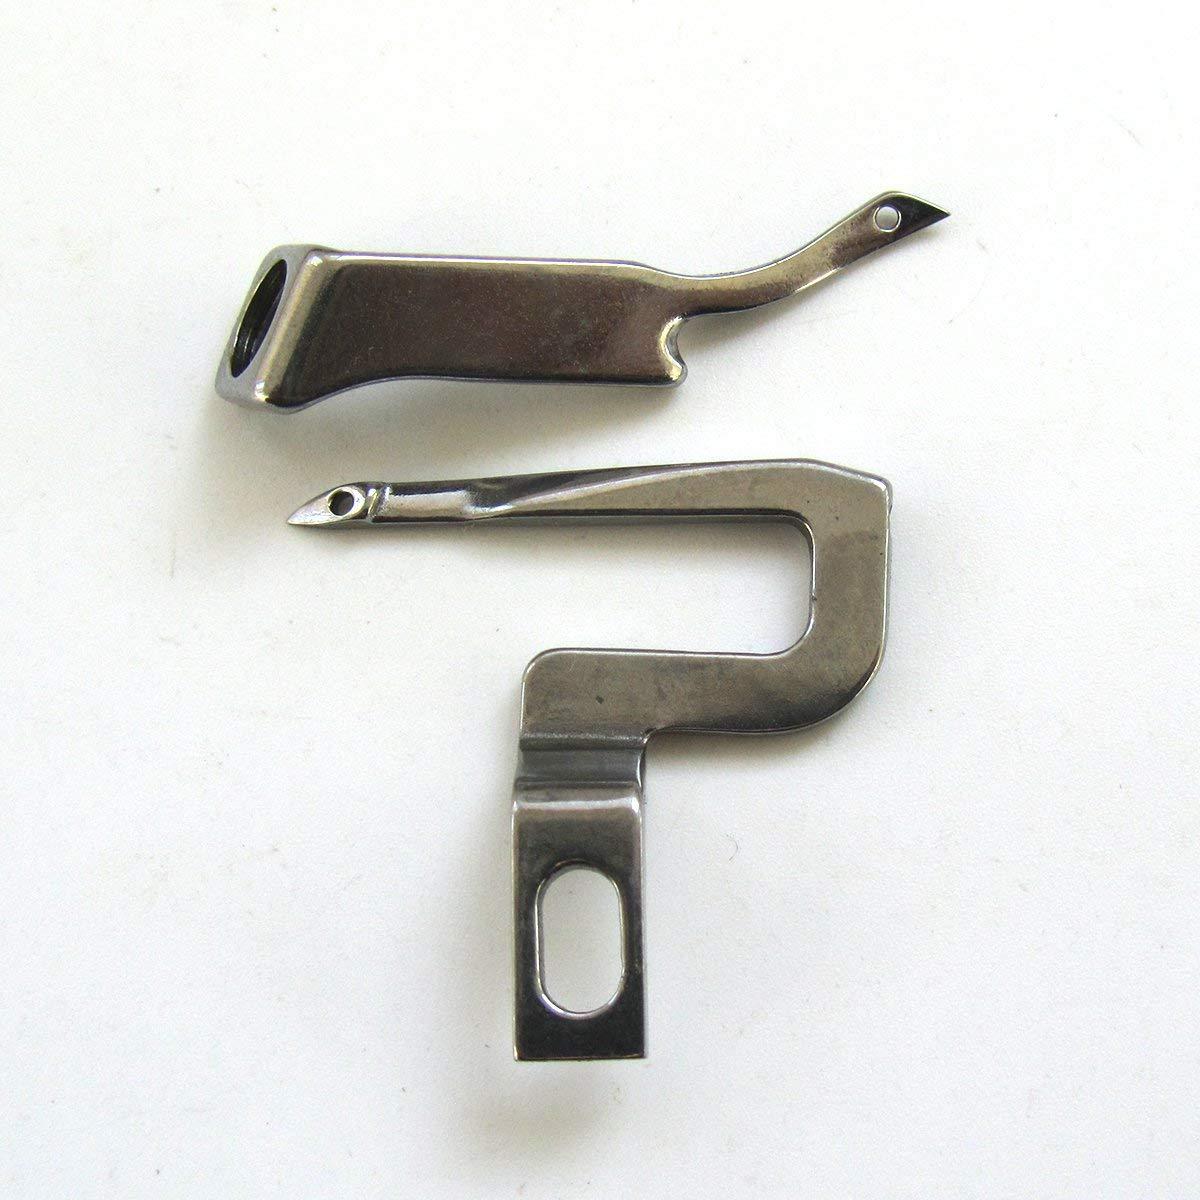 Right CKPSMS Brand fit for Singer 4U12,14U12A,14U234,14SH644,14SH654 fit for Pfaff 756 Upper Looper-410434 1PCS #410434 Upper Looper